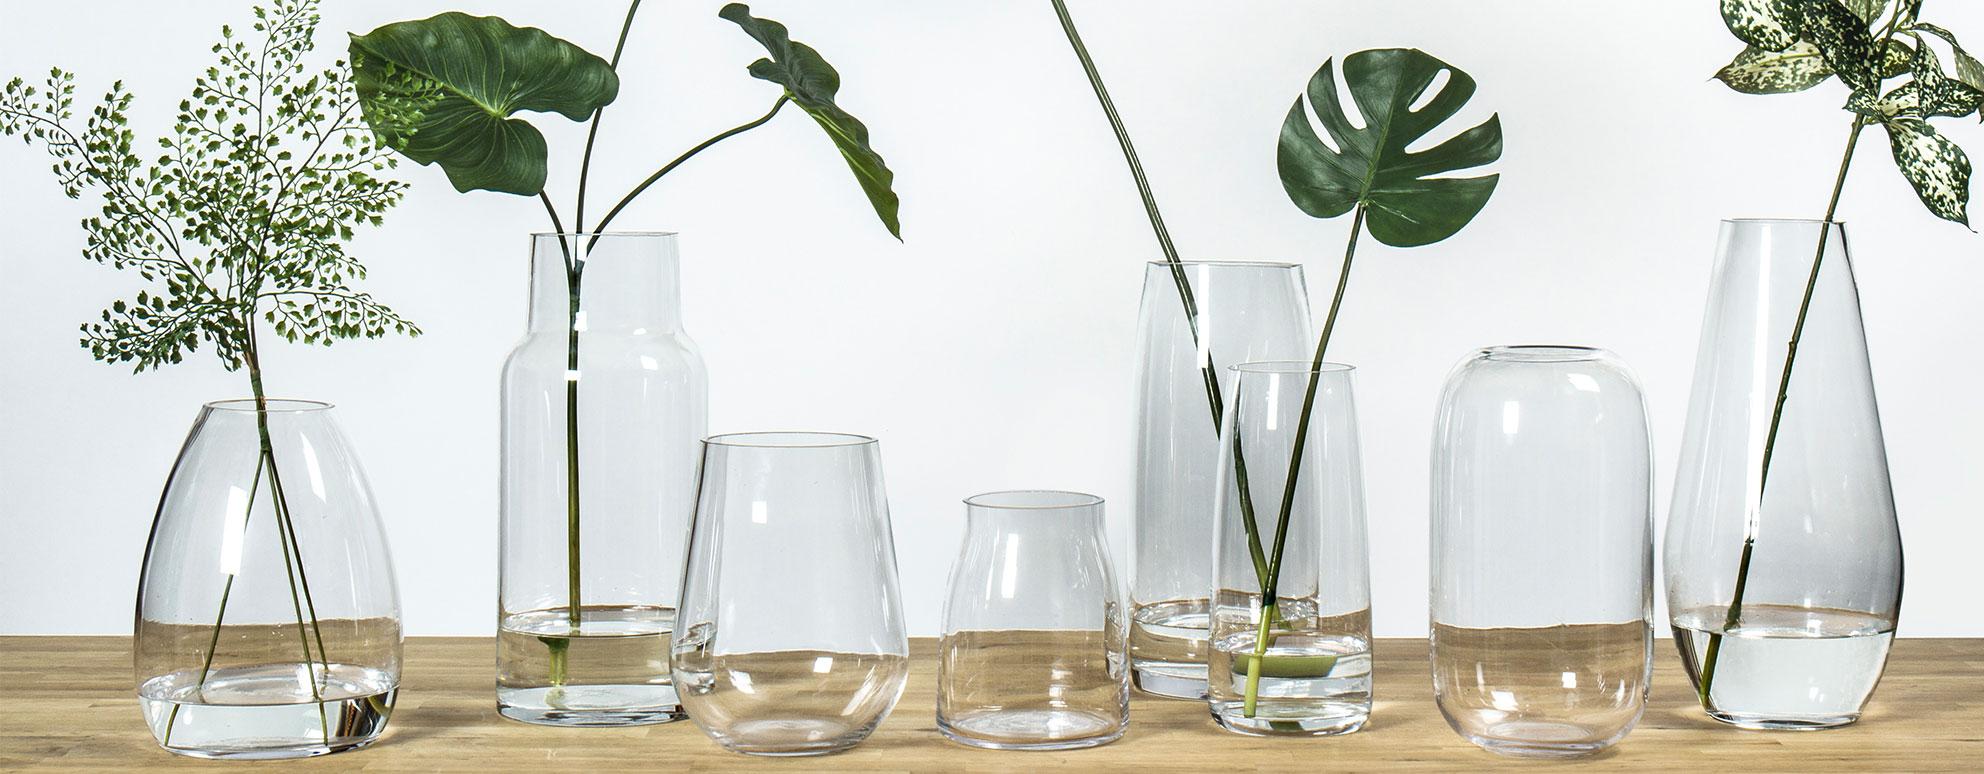 Amalfi Glassware.jpg